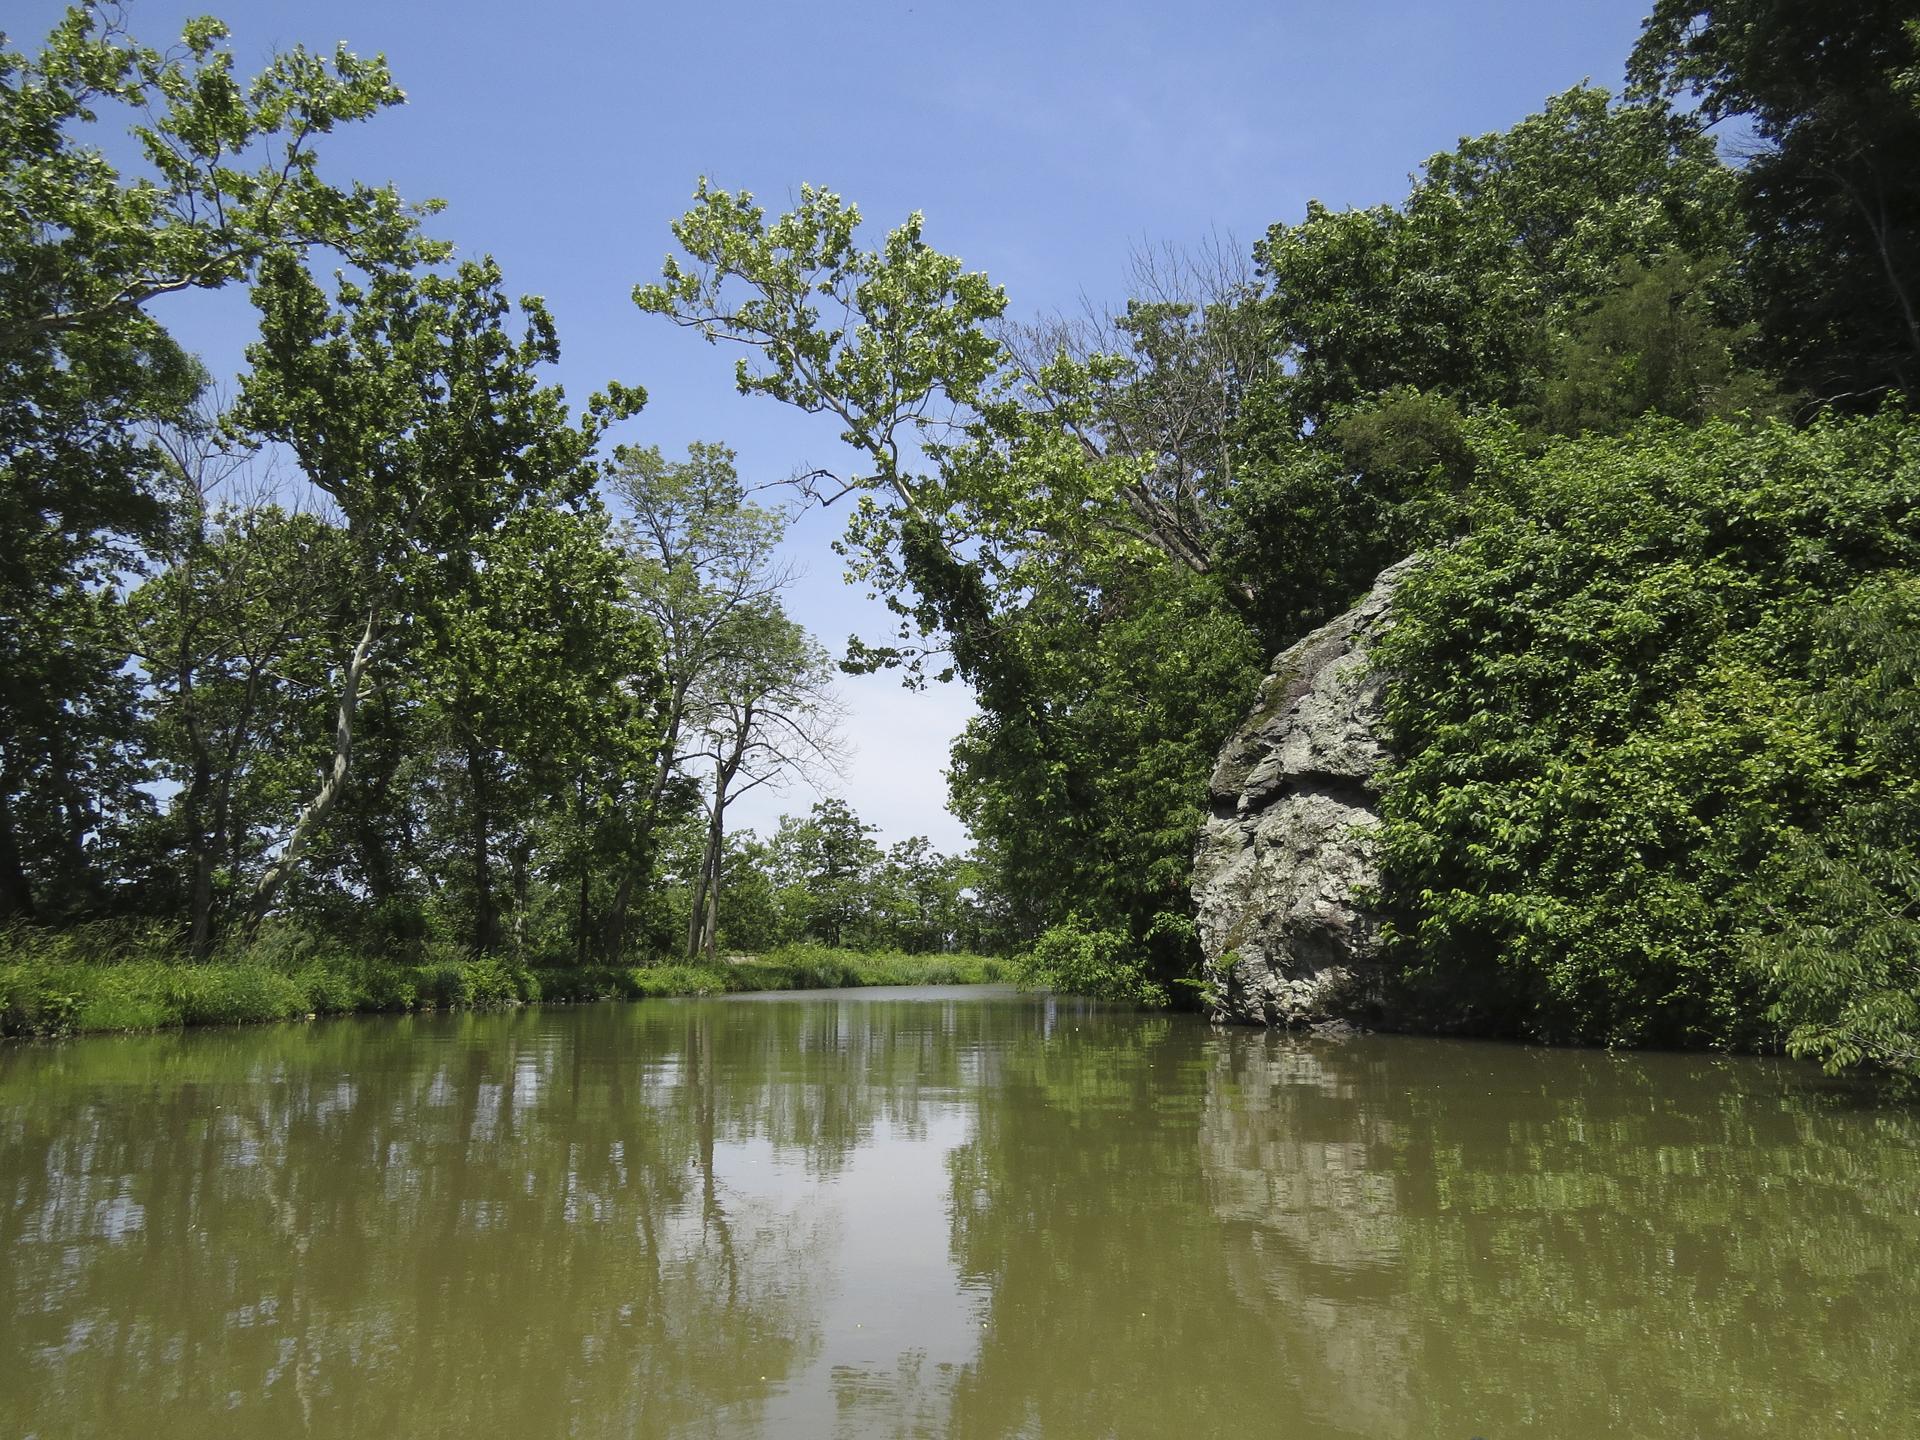 kayaking-maryland-water-nature-outdoors-c&o-canal-potomac-river